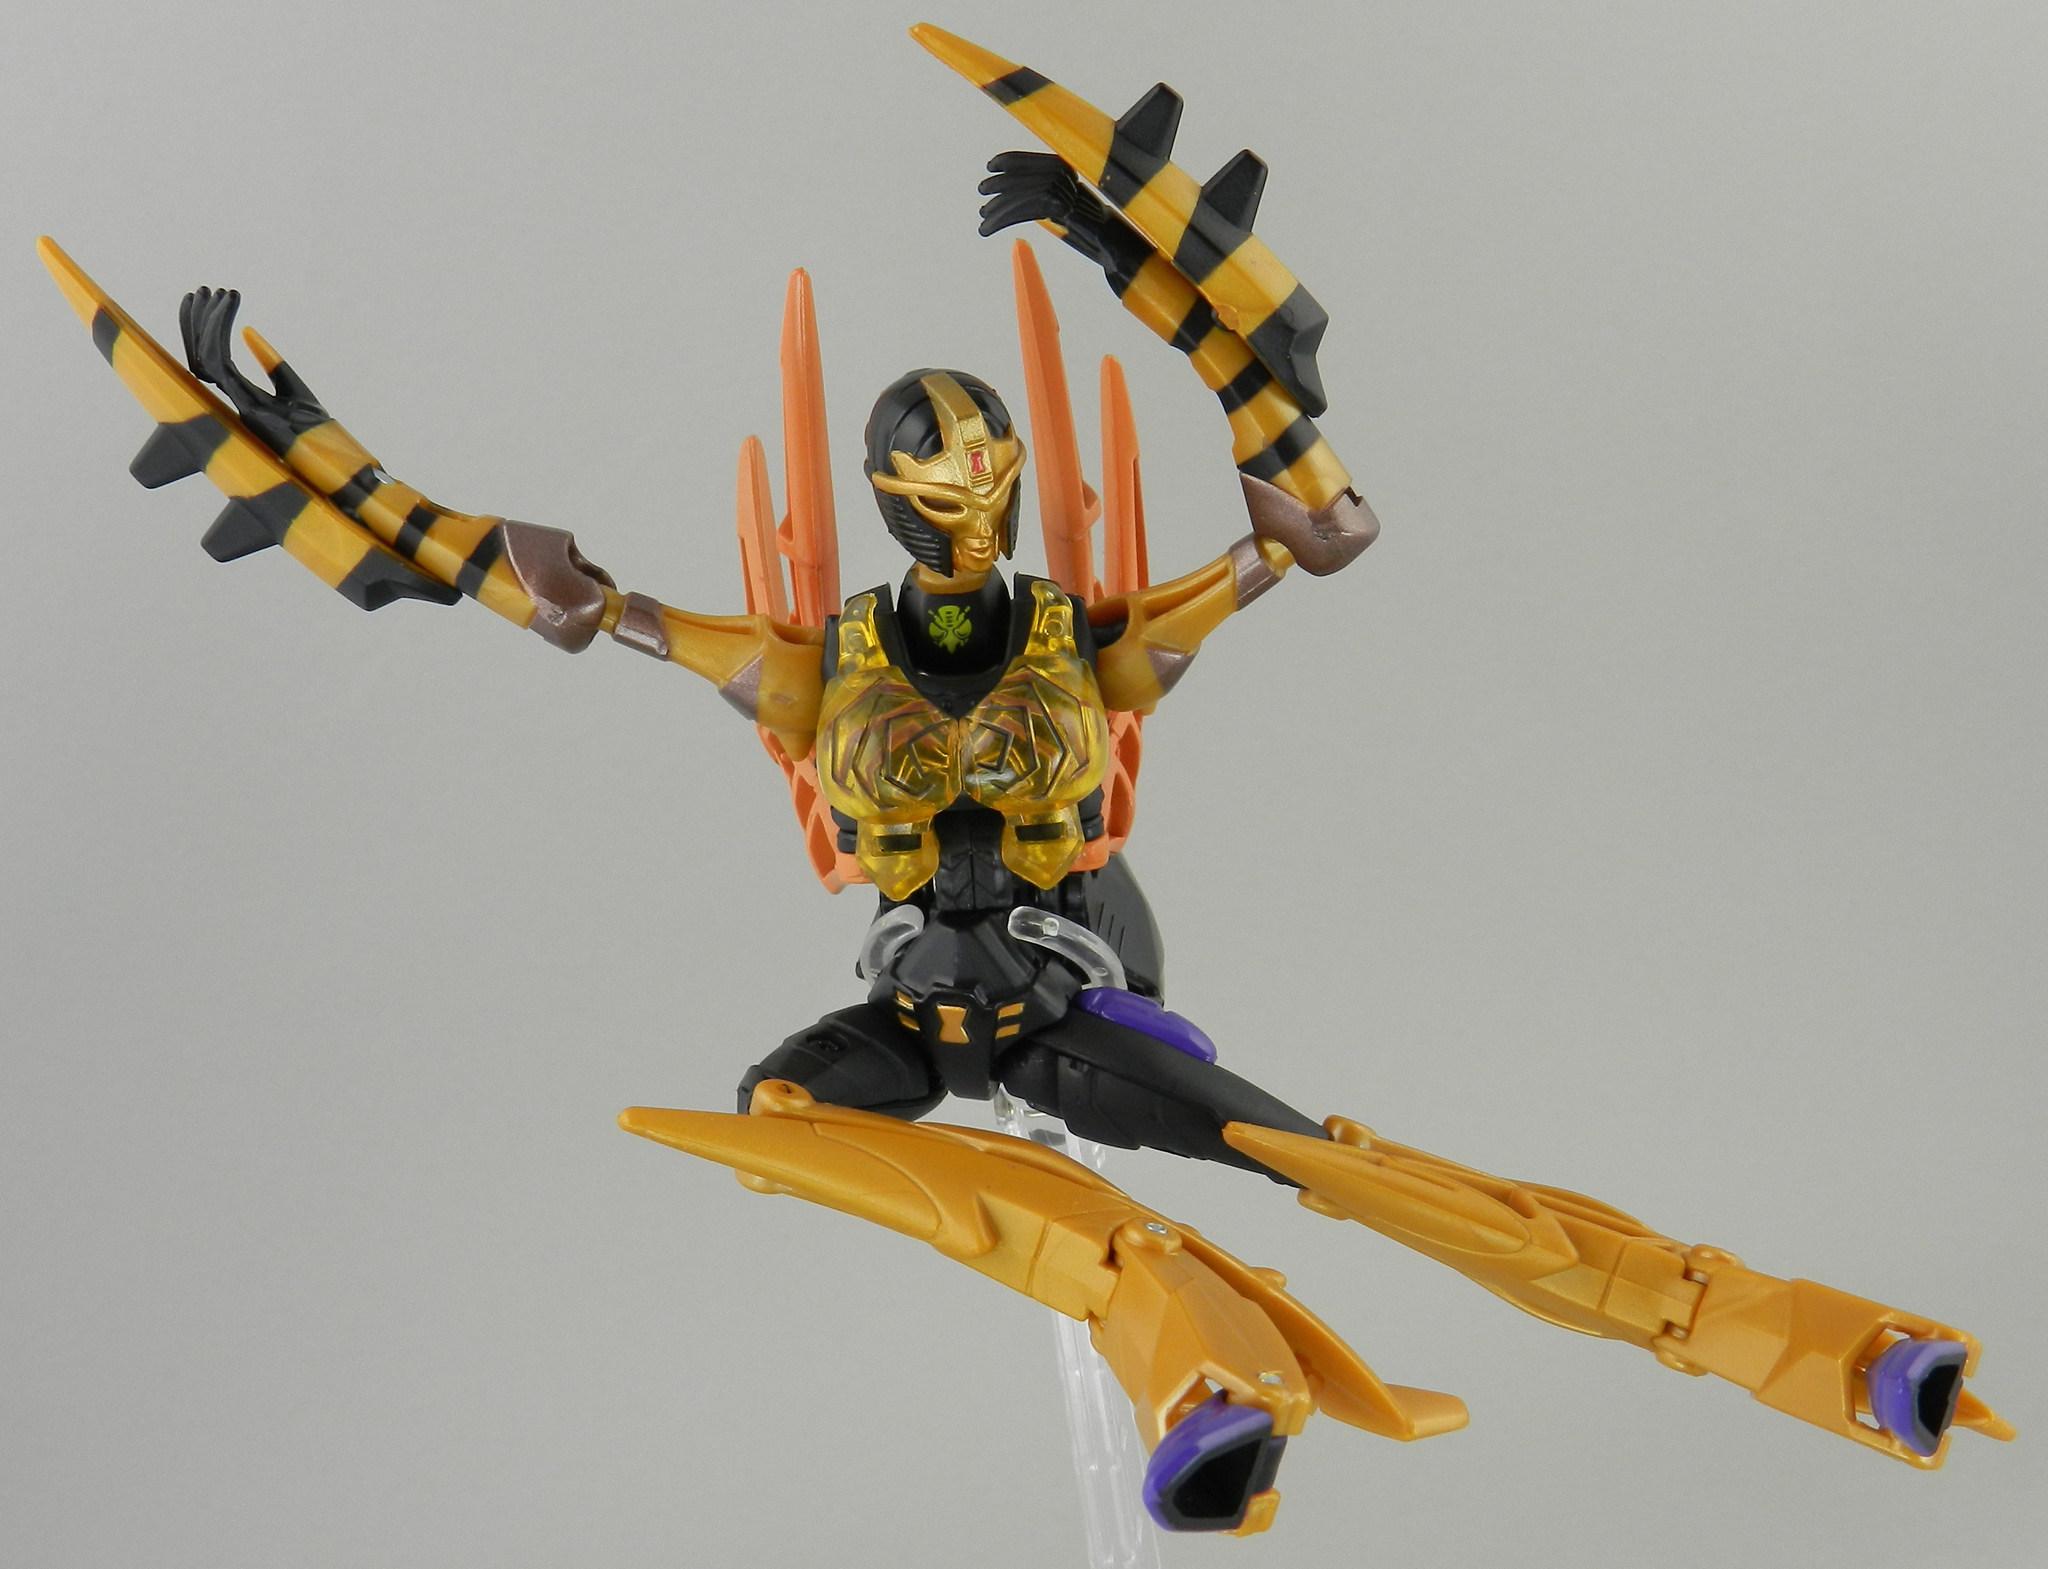 Transformers Legends Blackarachnia In Hand Gallery